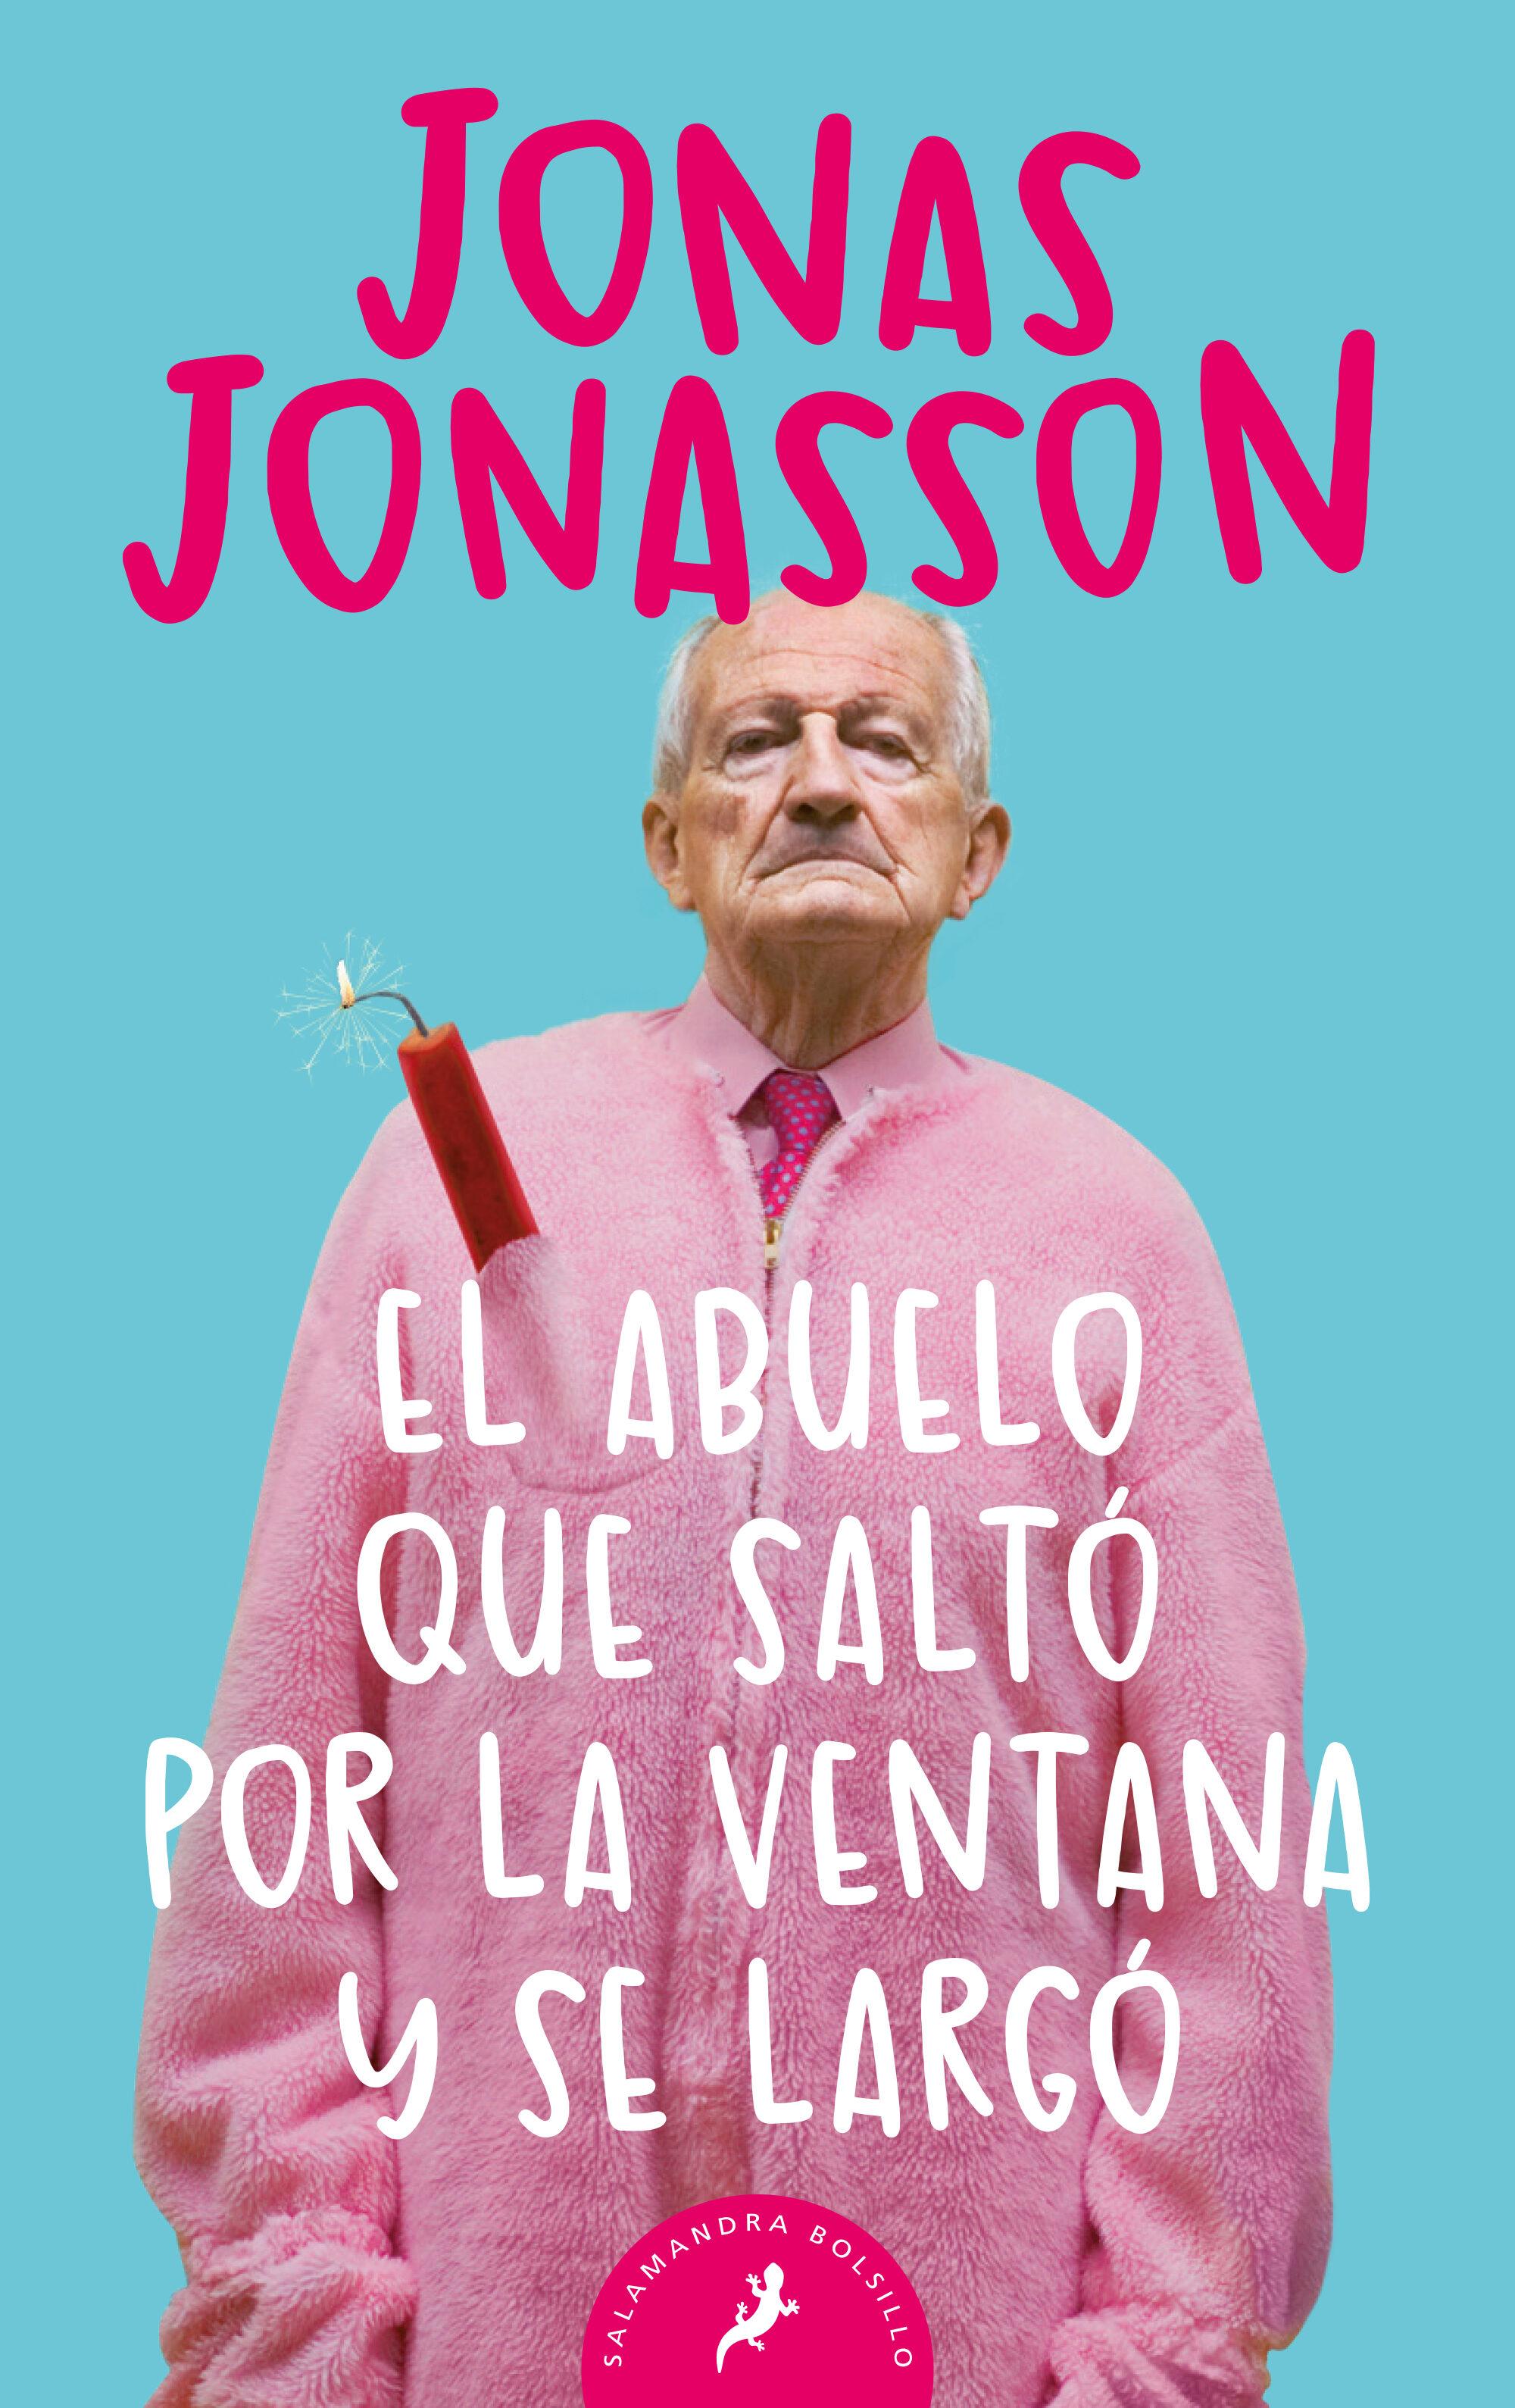 El Abuelo Que Salto Por La Ventana Y Se Largo por Jonas Jonasson